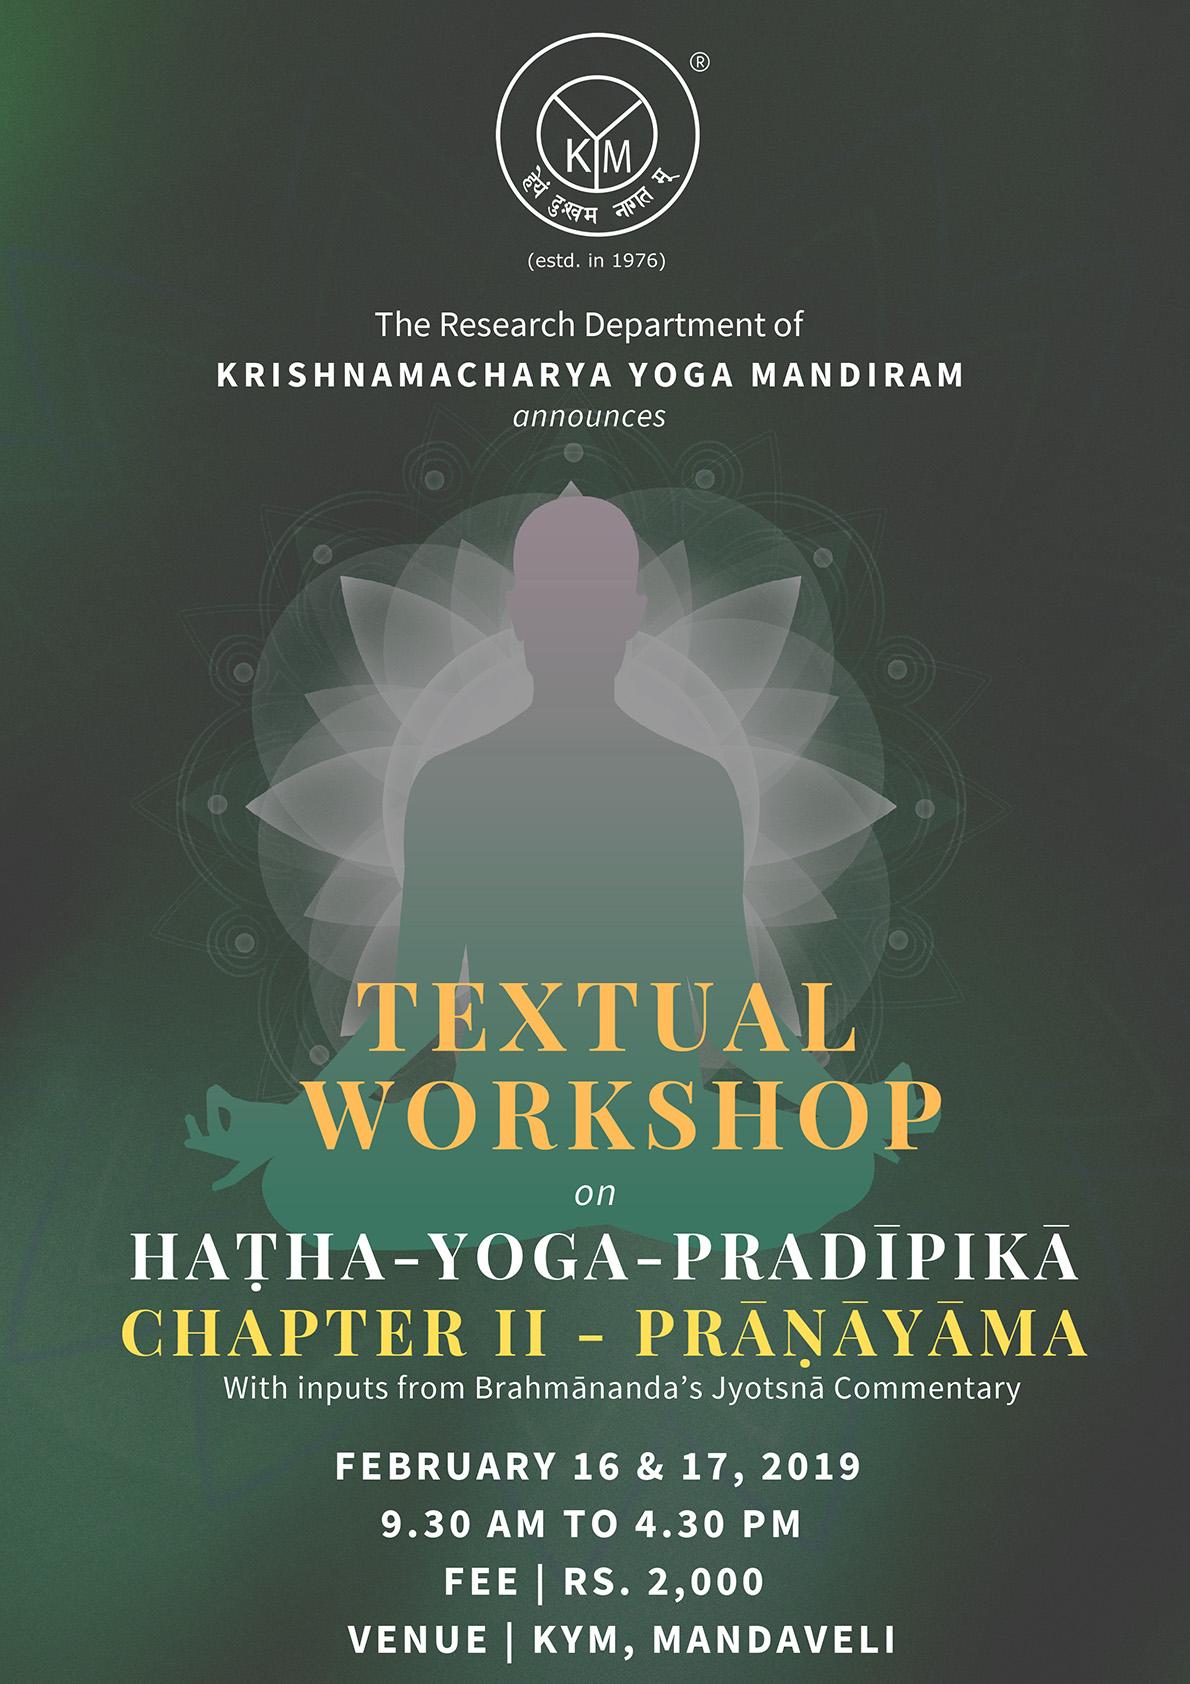 International Textual Workshop On Haṭha-Yoga-Pradīpikā, Focus On Prāṇāyāma